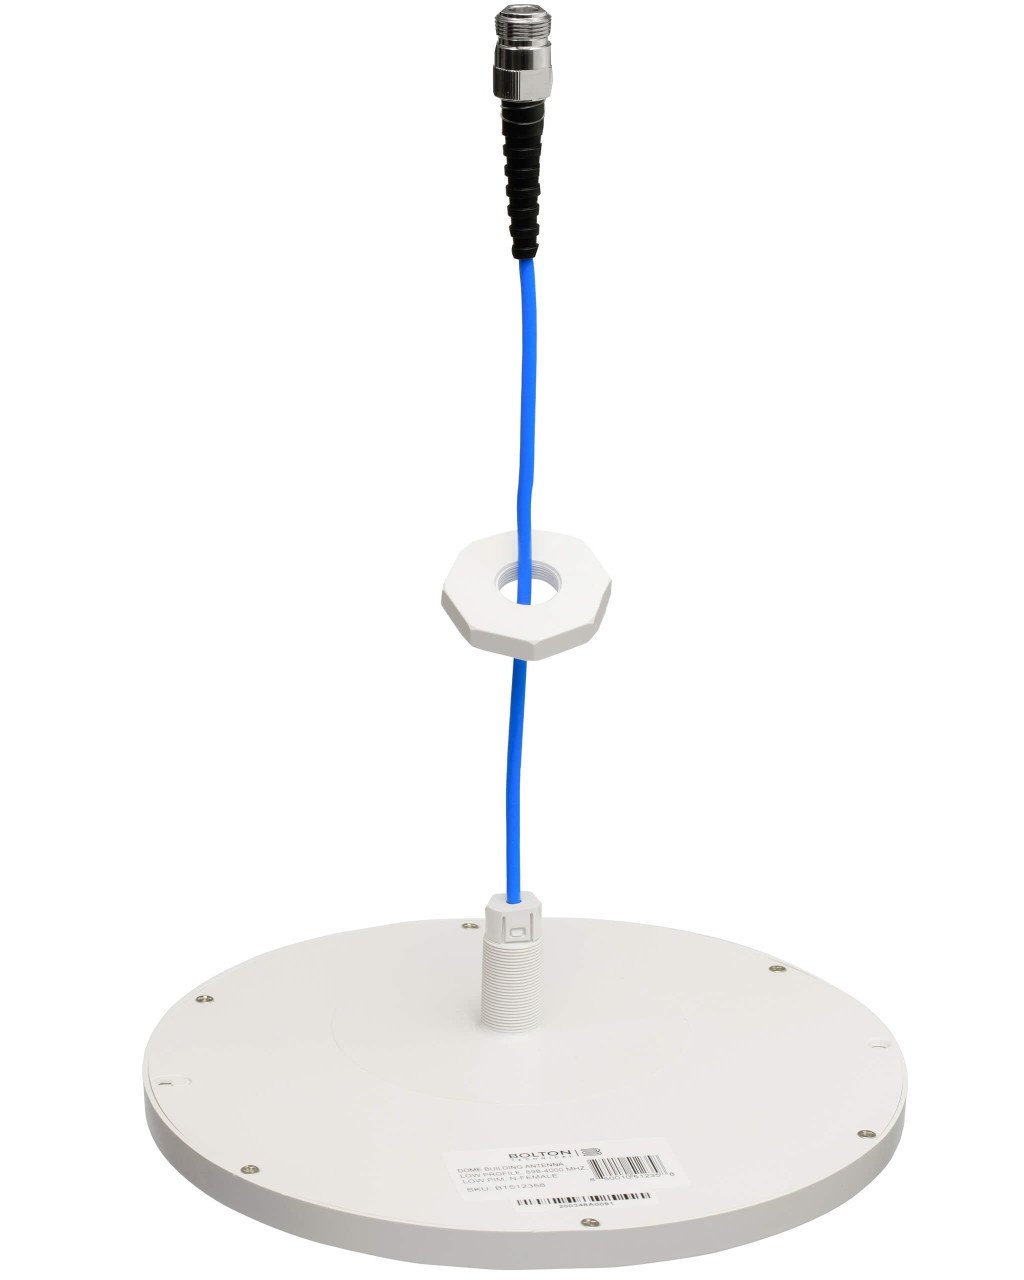 The Rondo - Low Profile Dome Antenna